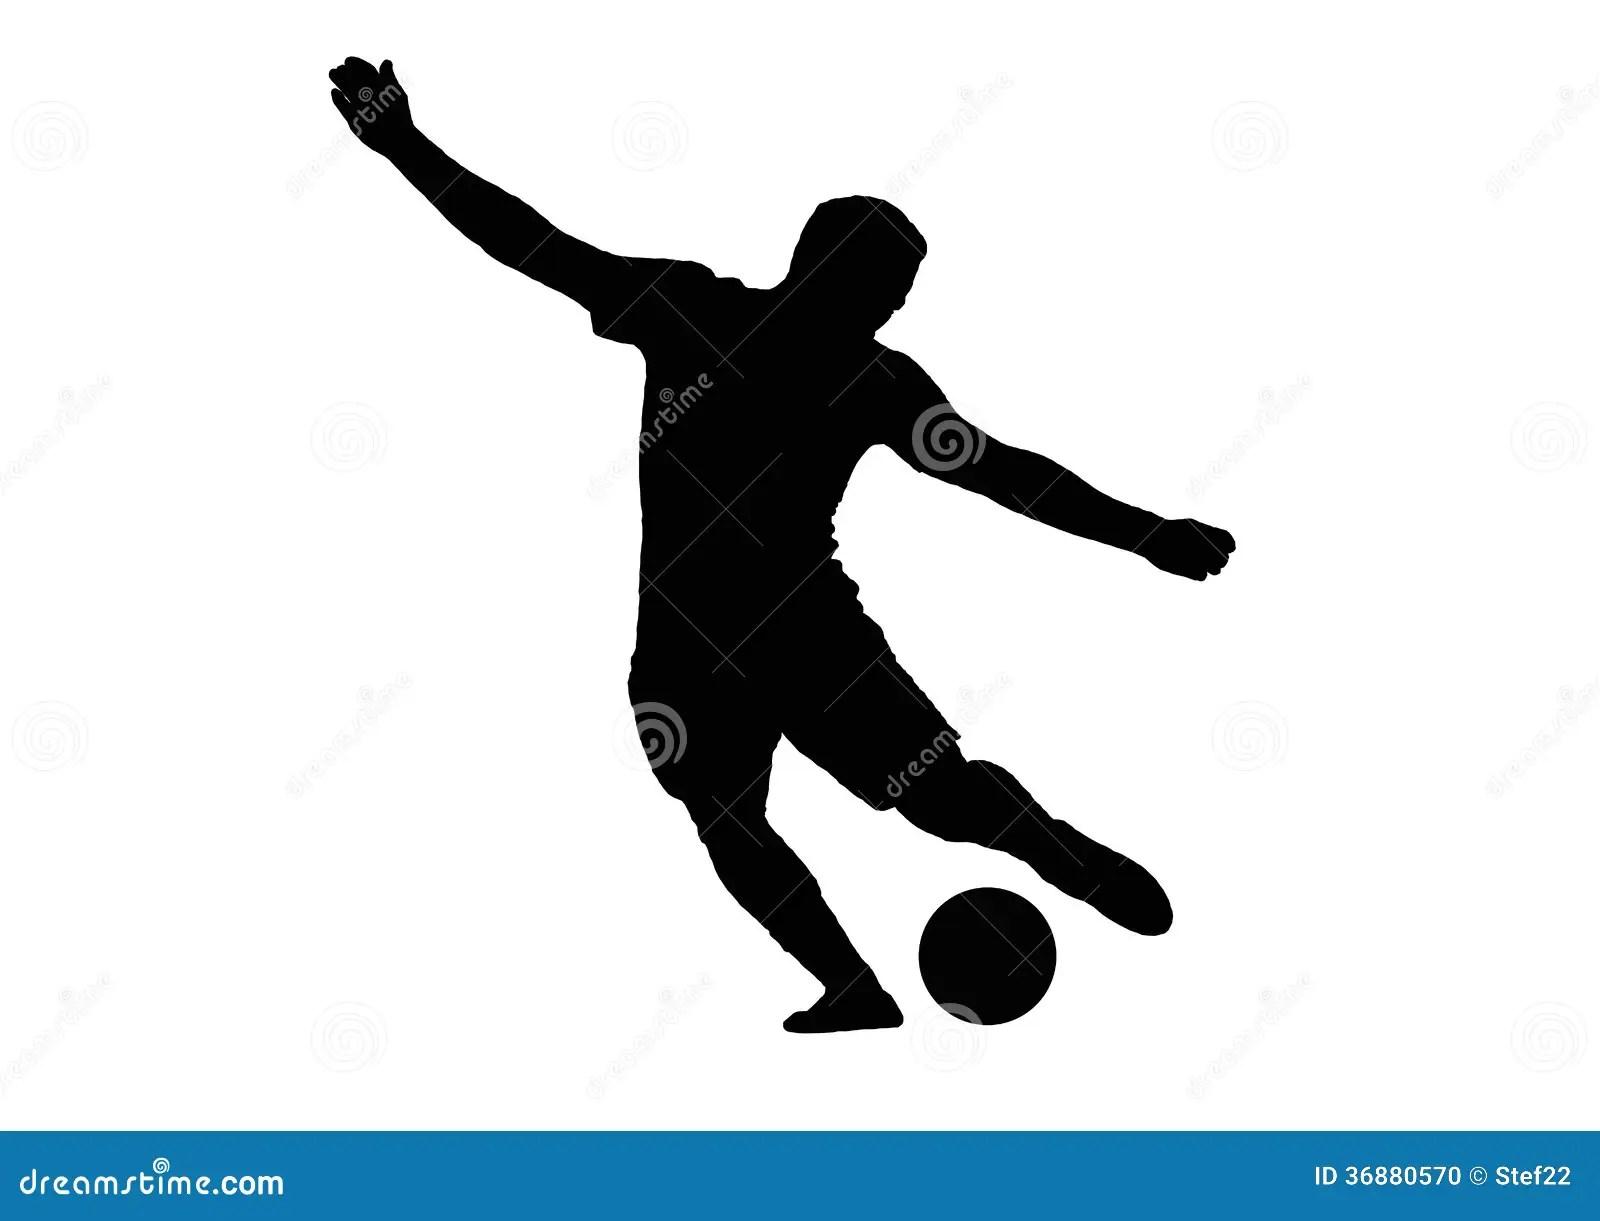 Persona 4 The Animation Wallpaper Football Player Shooting Ball Stock Photo Image Of